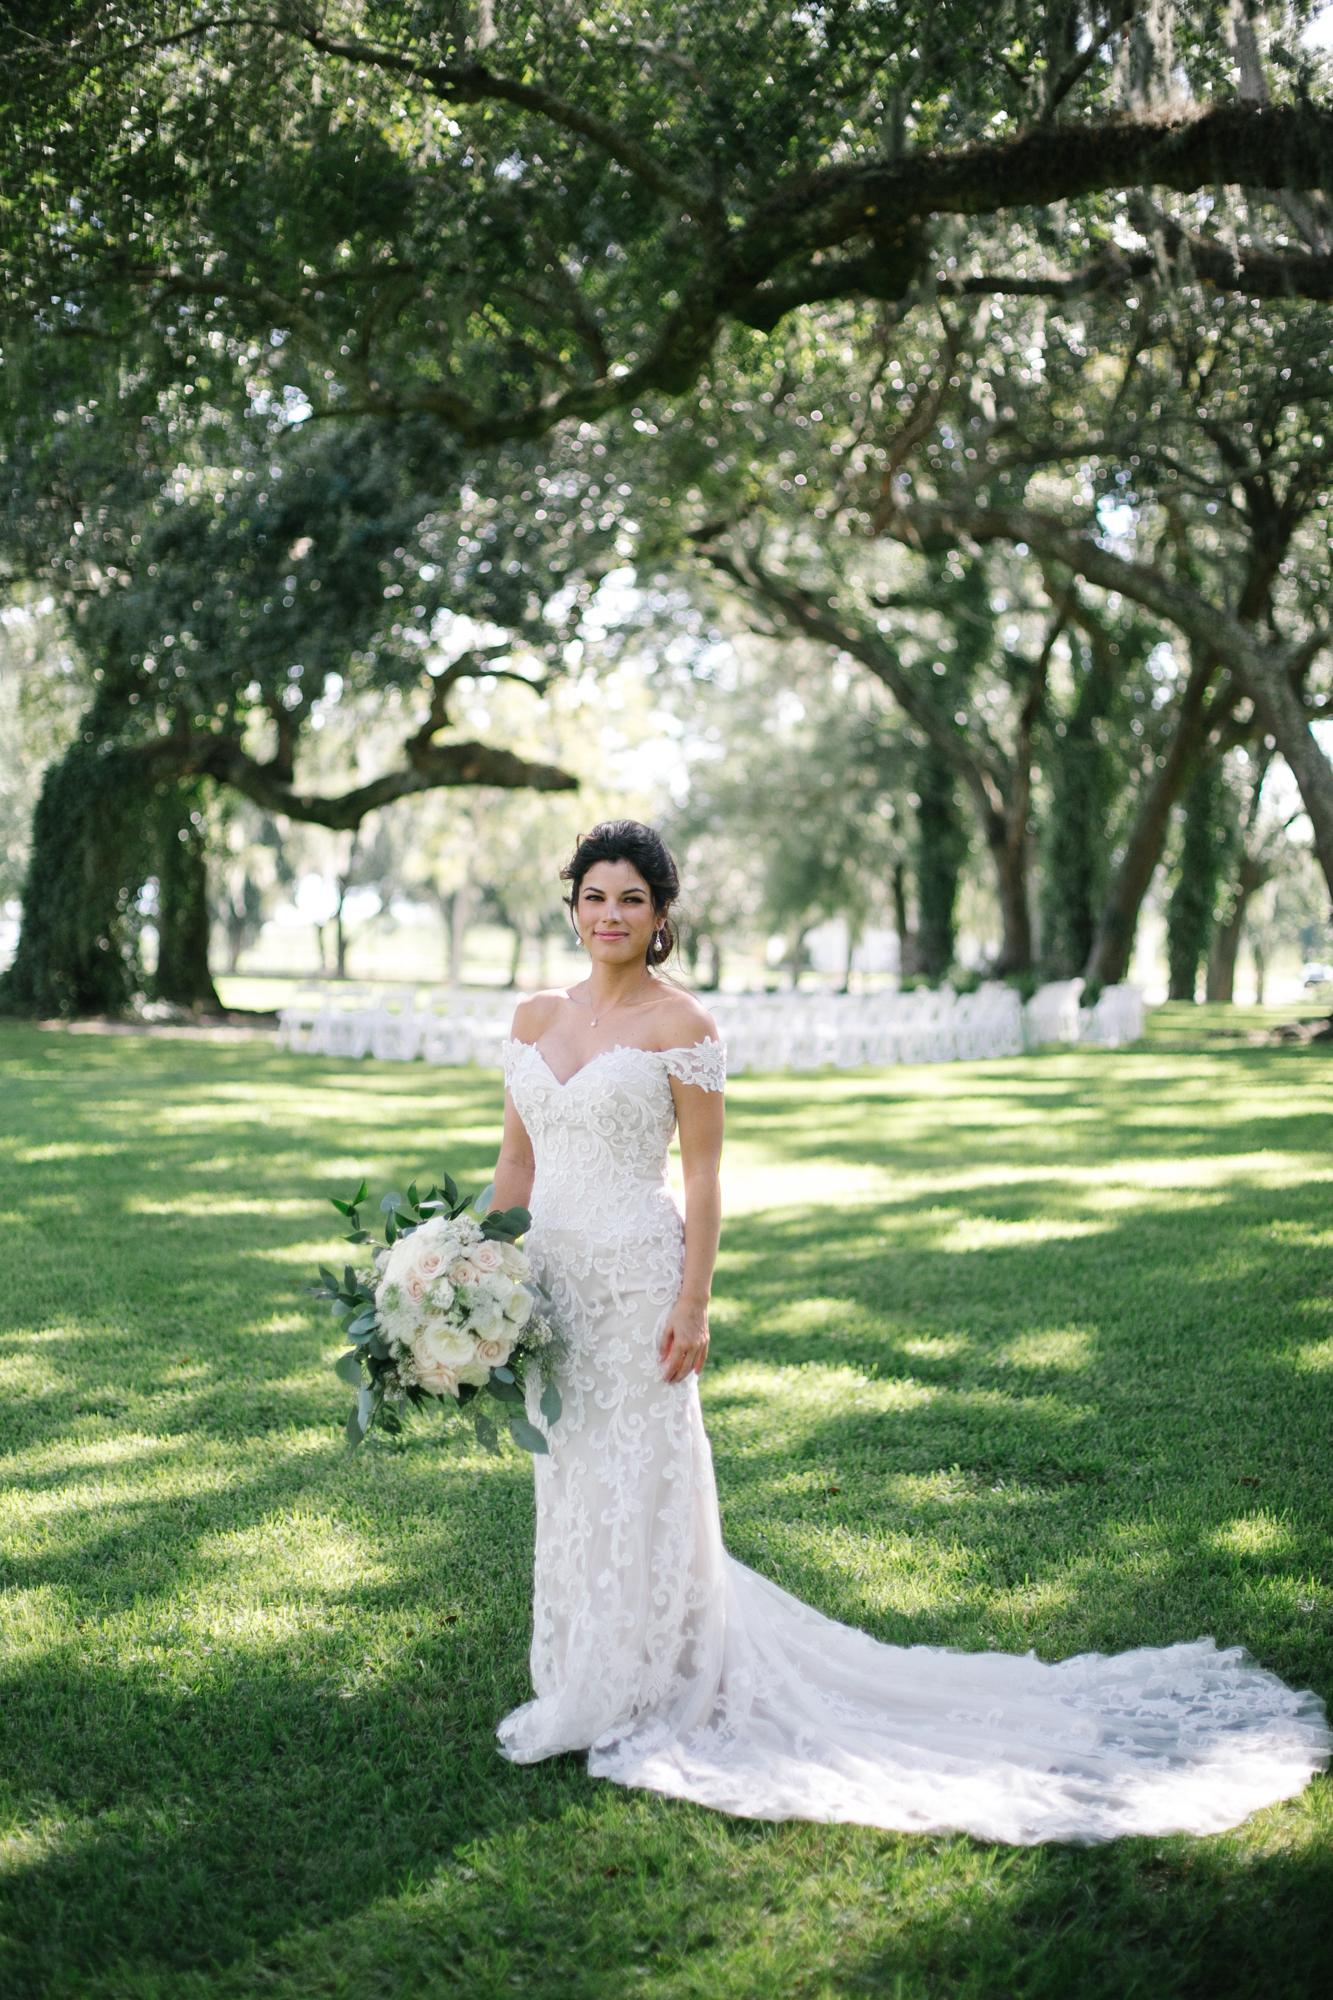 Gautier_Wedding_Photographer-44.jpg